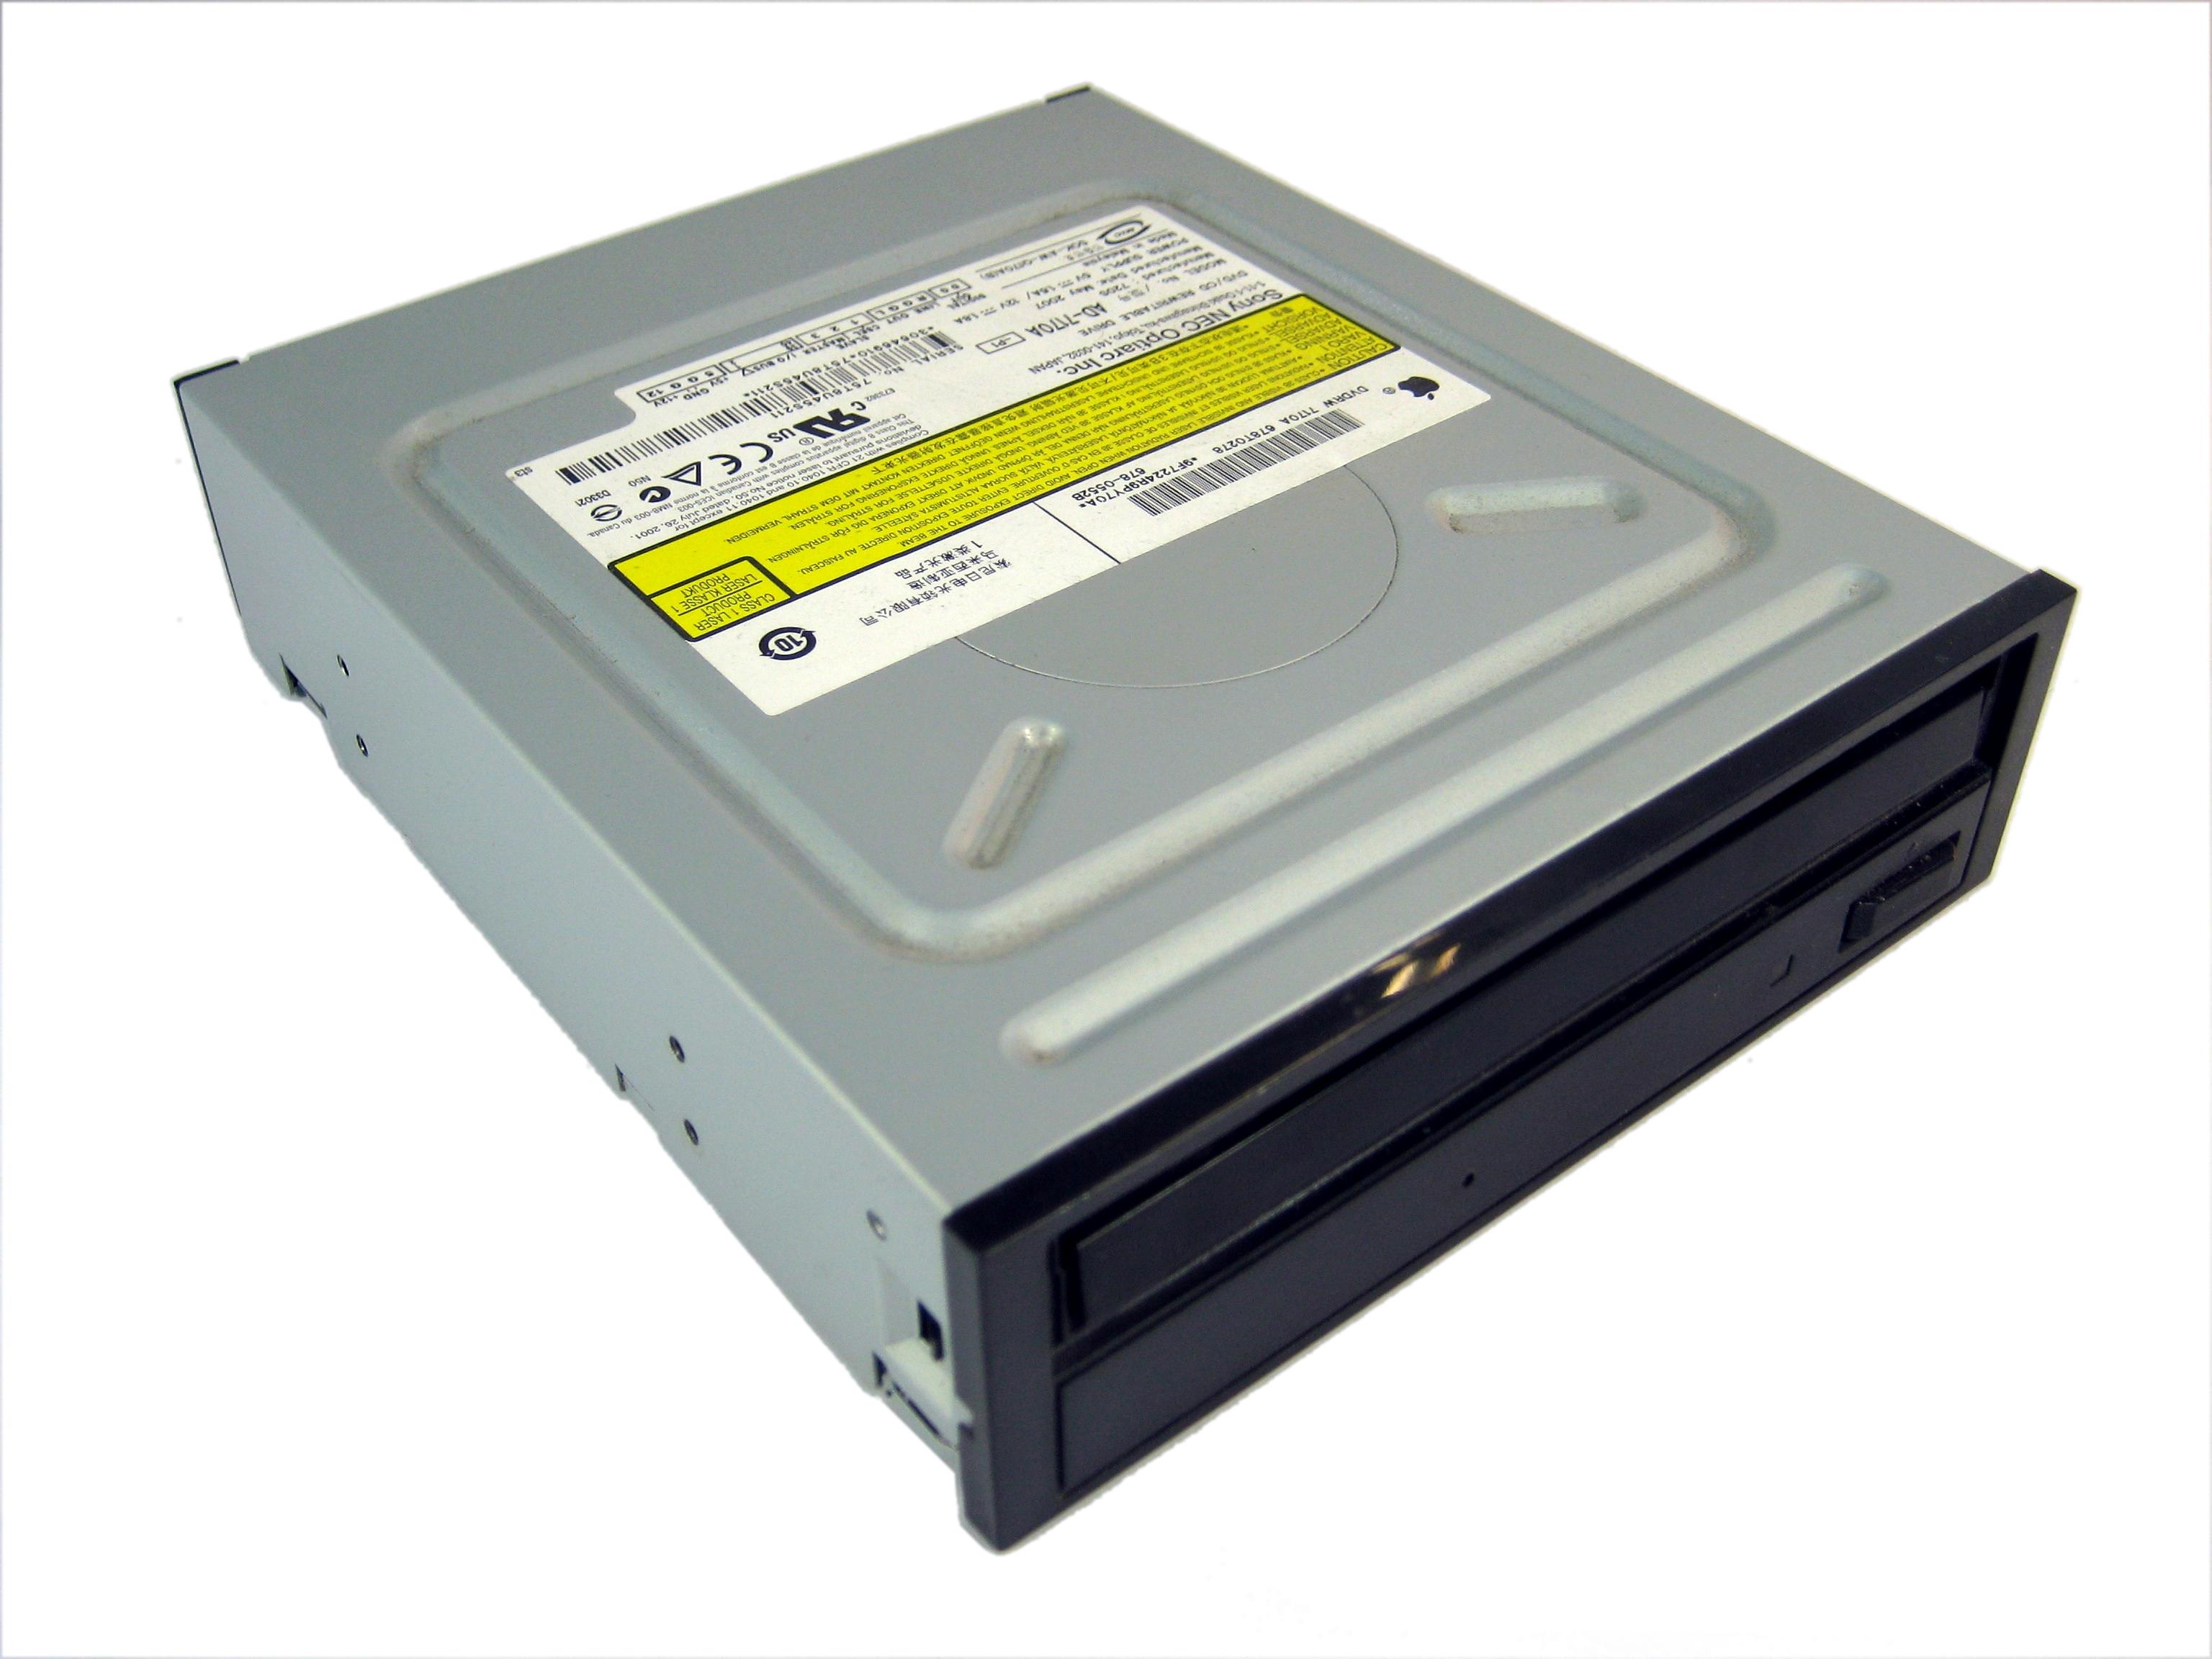 Apple 678-0552C Mac Pro (A1186) IDE DVD/CD Rewritable Optical Drive - AD-7170A